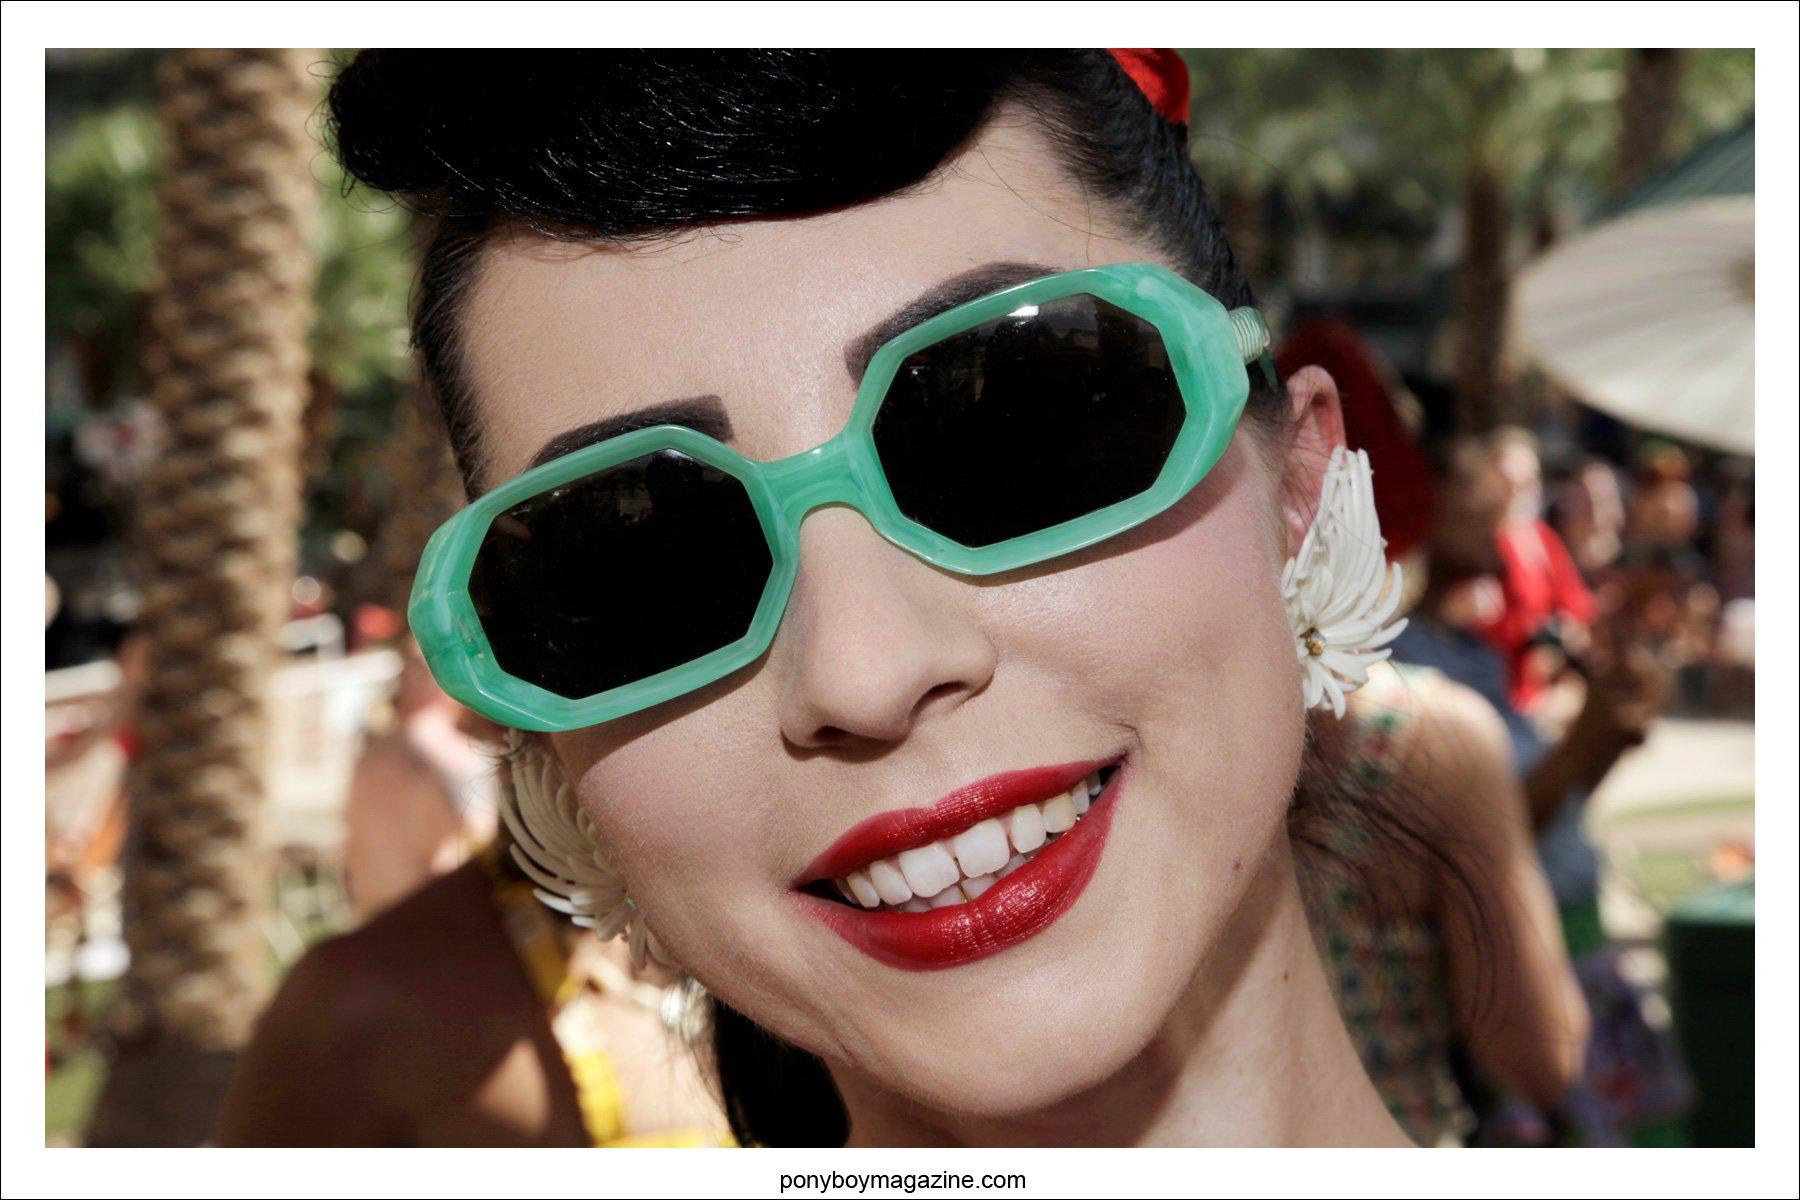 Vintage 1950's sunglasses photographed by Ponyboy Magazine photographer Alexander Thompson at Viva Las Vegas pool party.